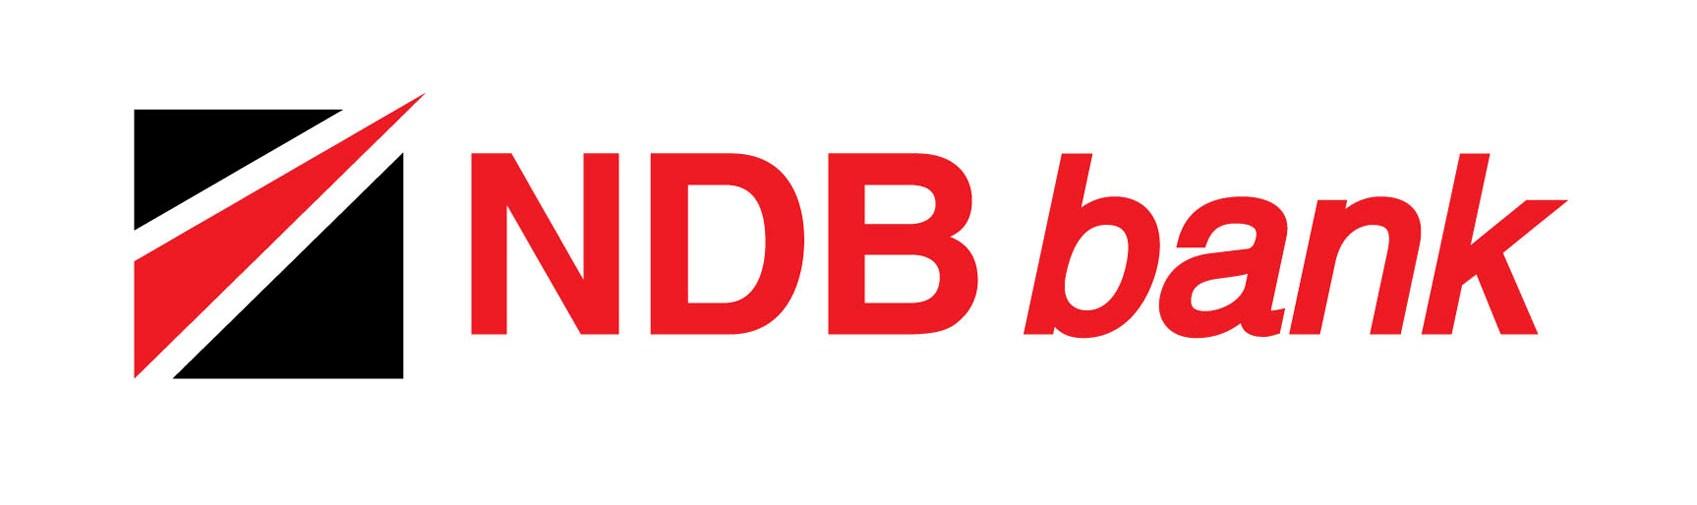 ndb-bank-logo